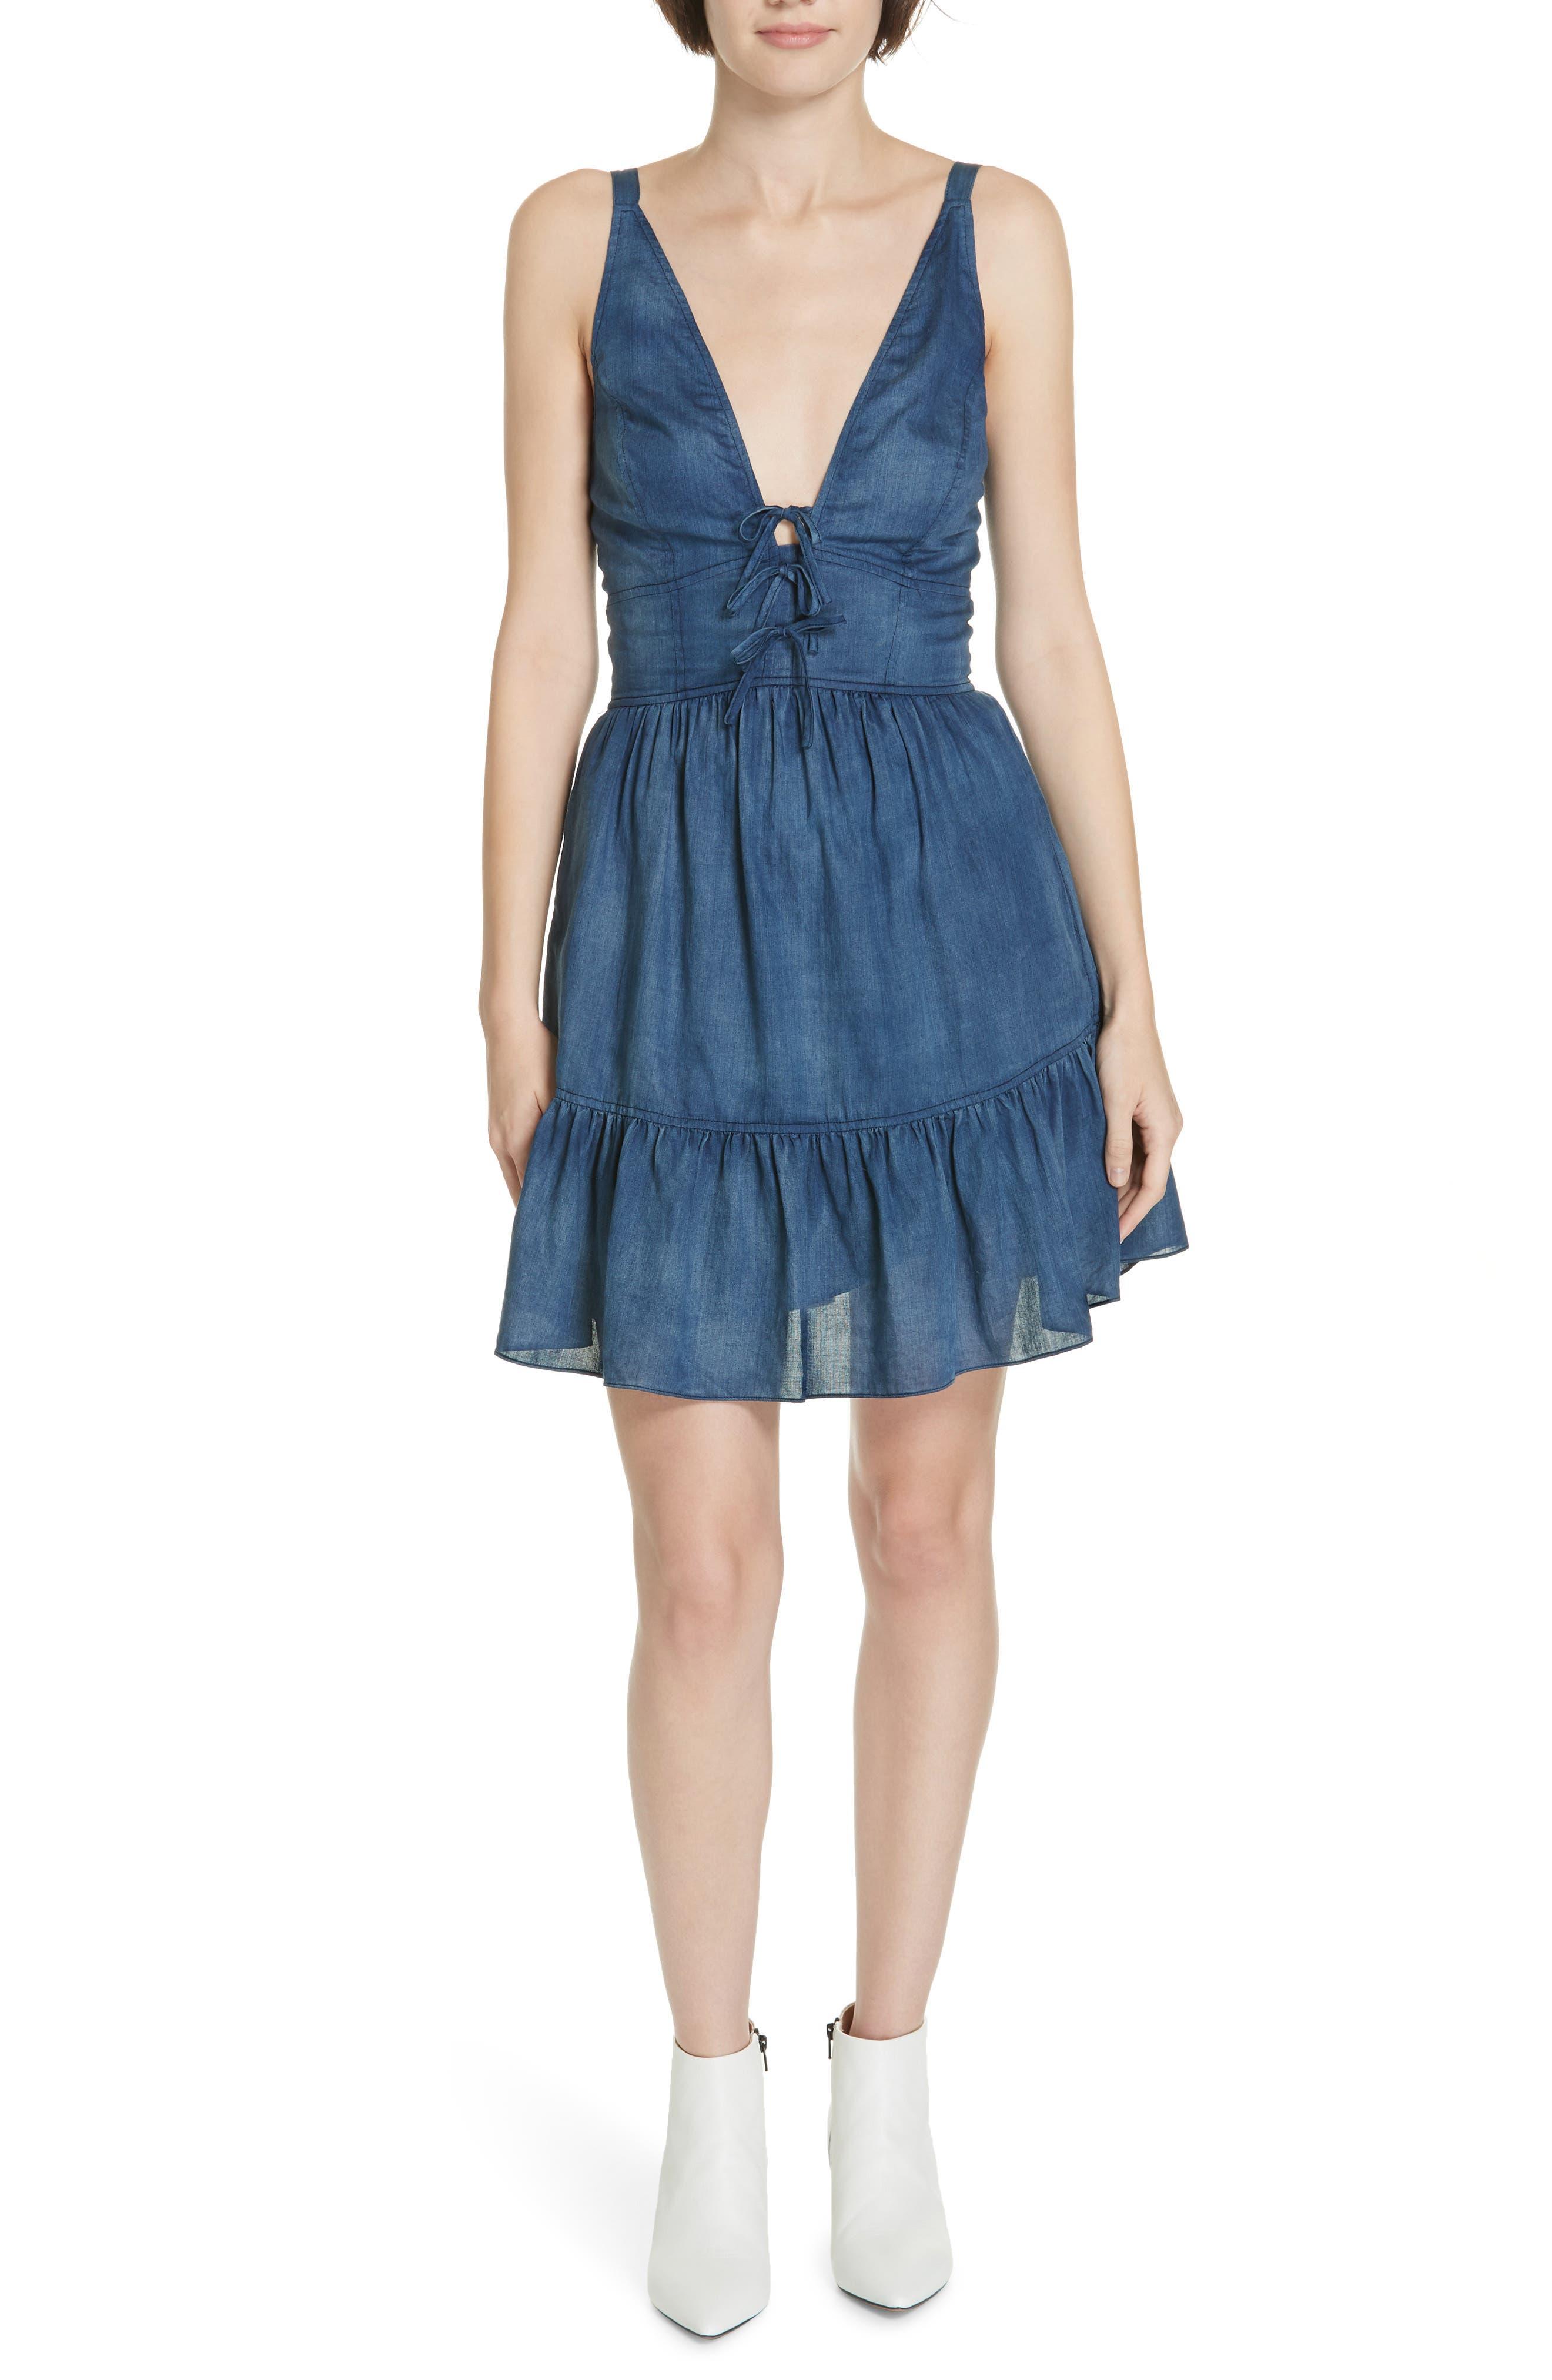 LA VIE REBECCA TAYLOR Sleeveless Tissue Denim Dress in Giverny Wash